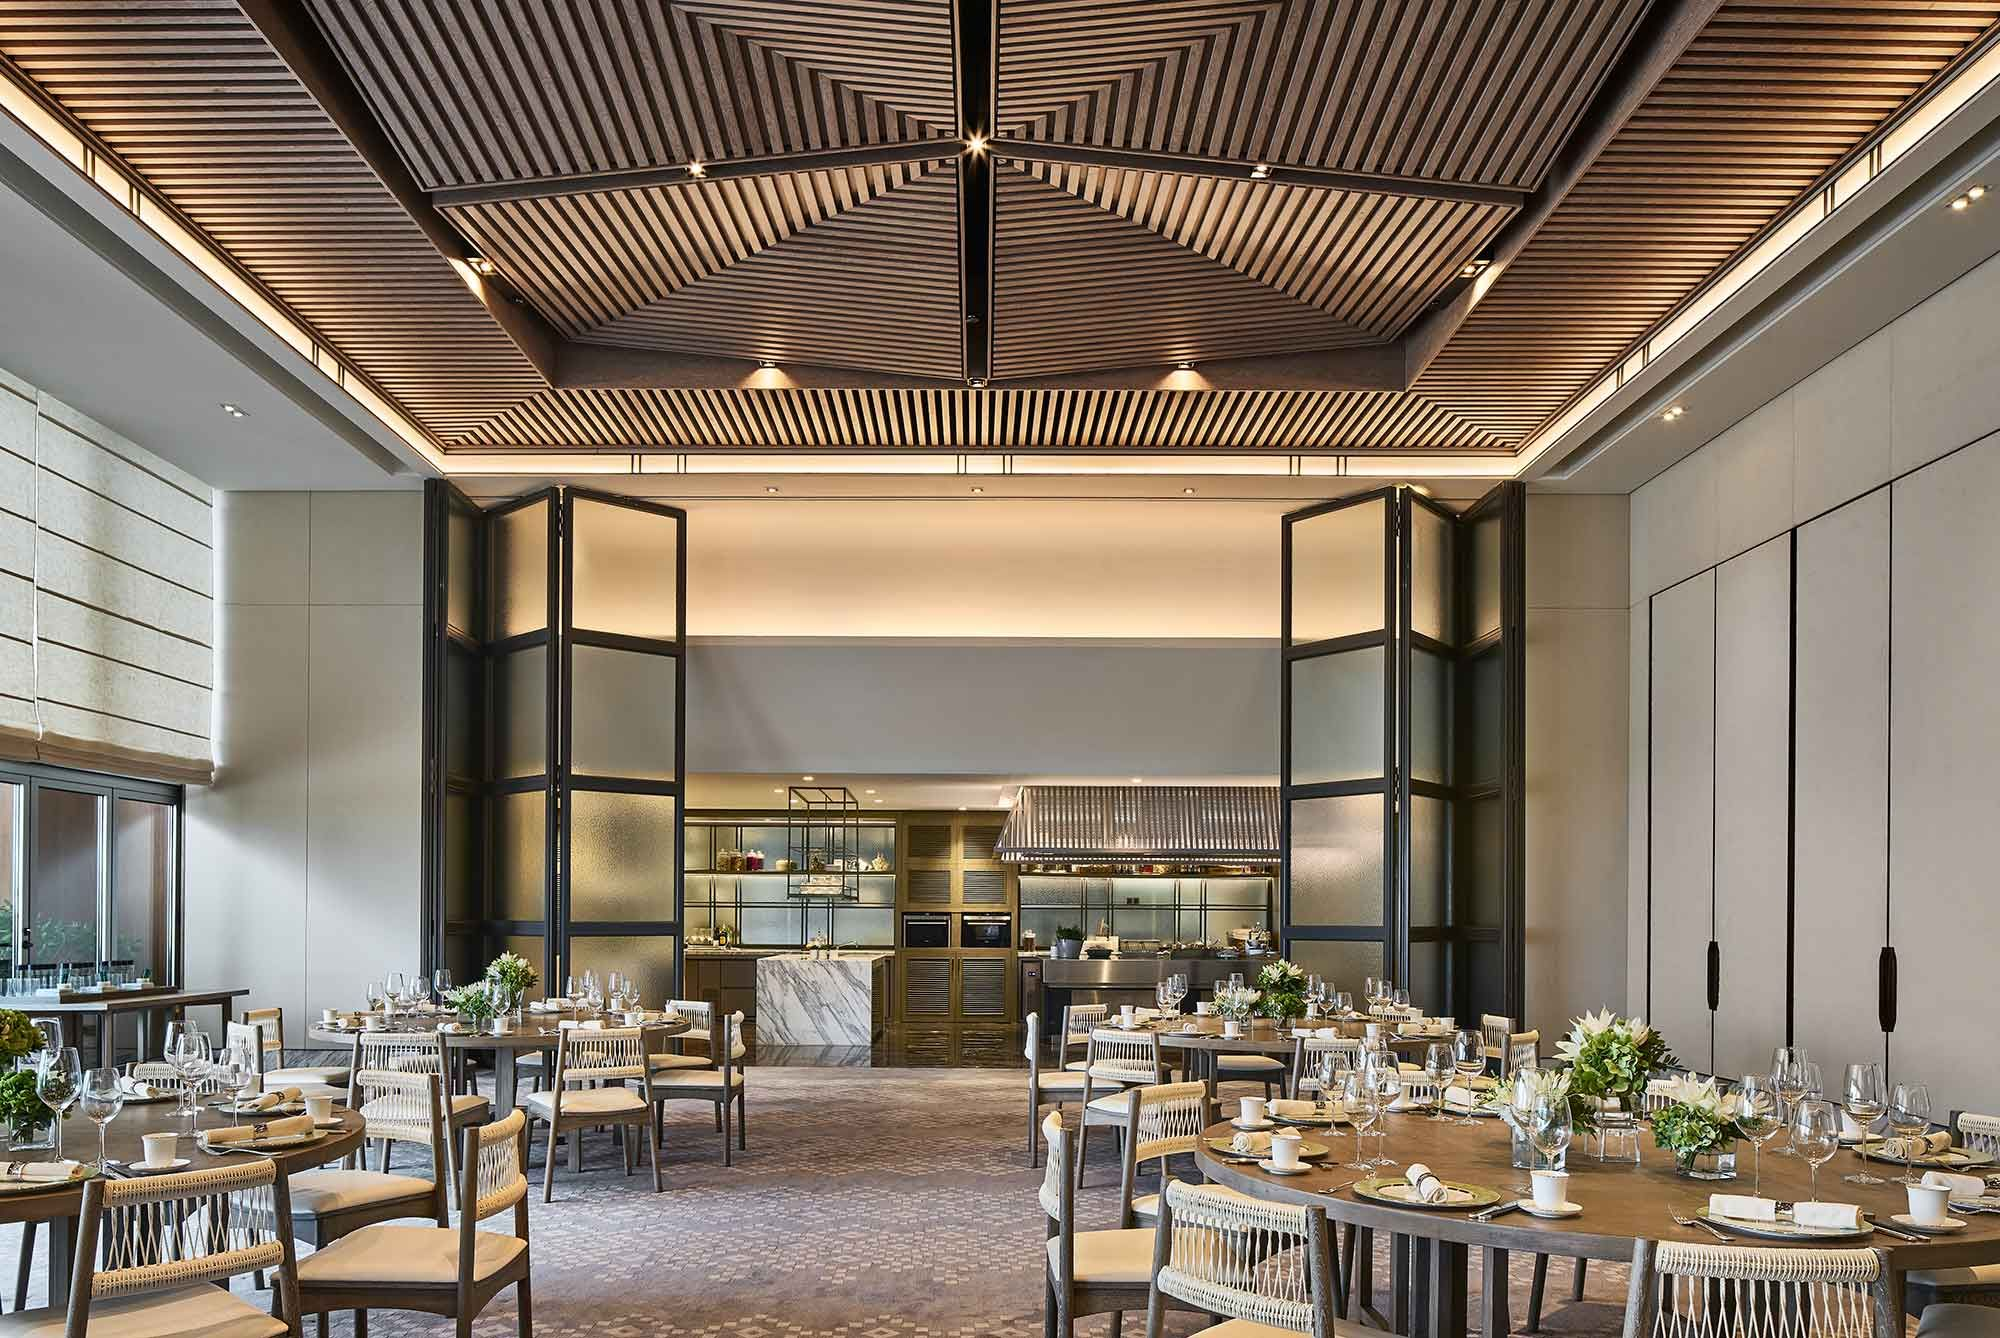 Rosewood Sanya Private Dining Room的圖片搜尋結果 False Ceiling